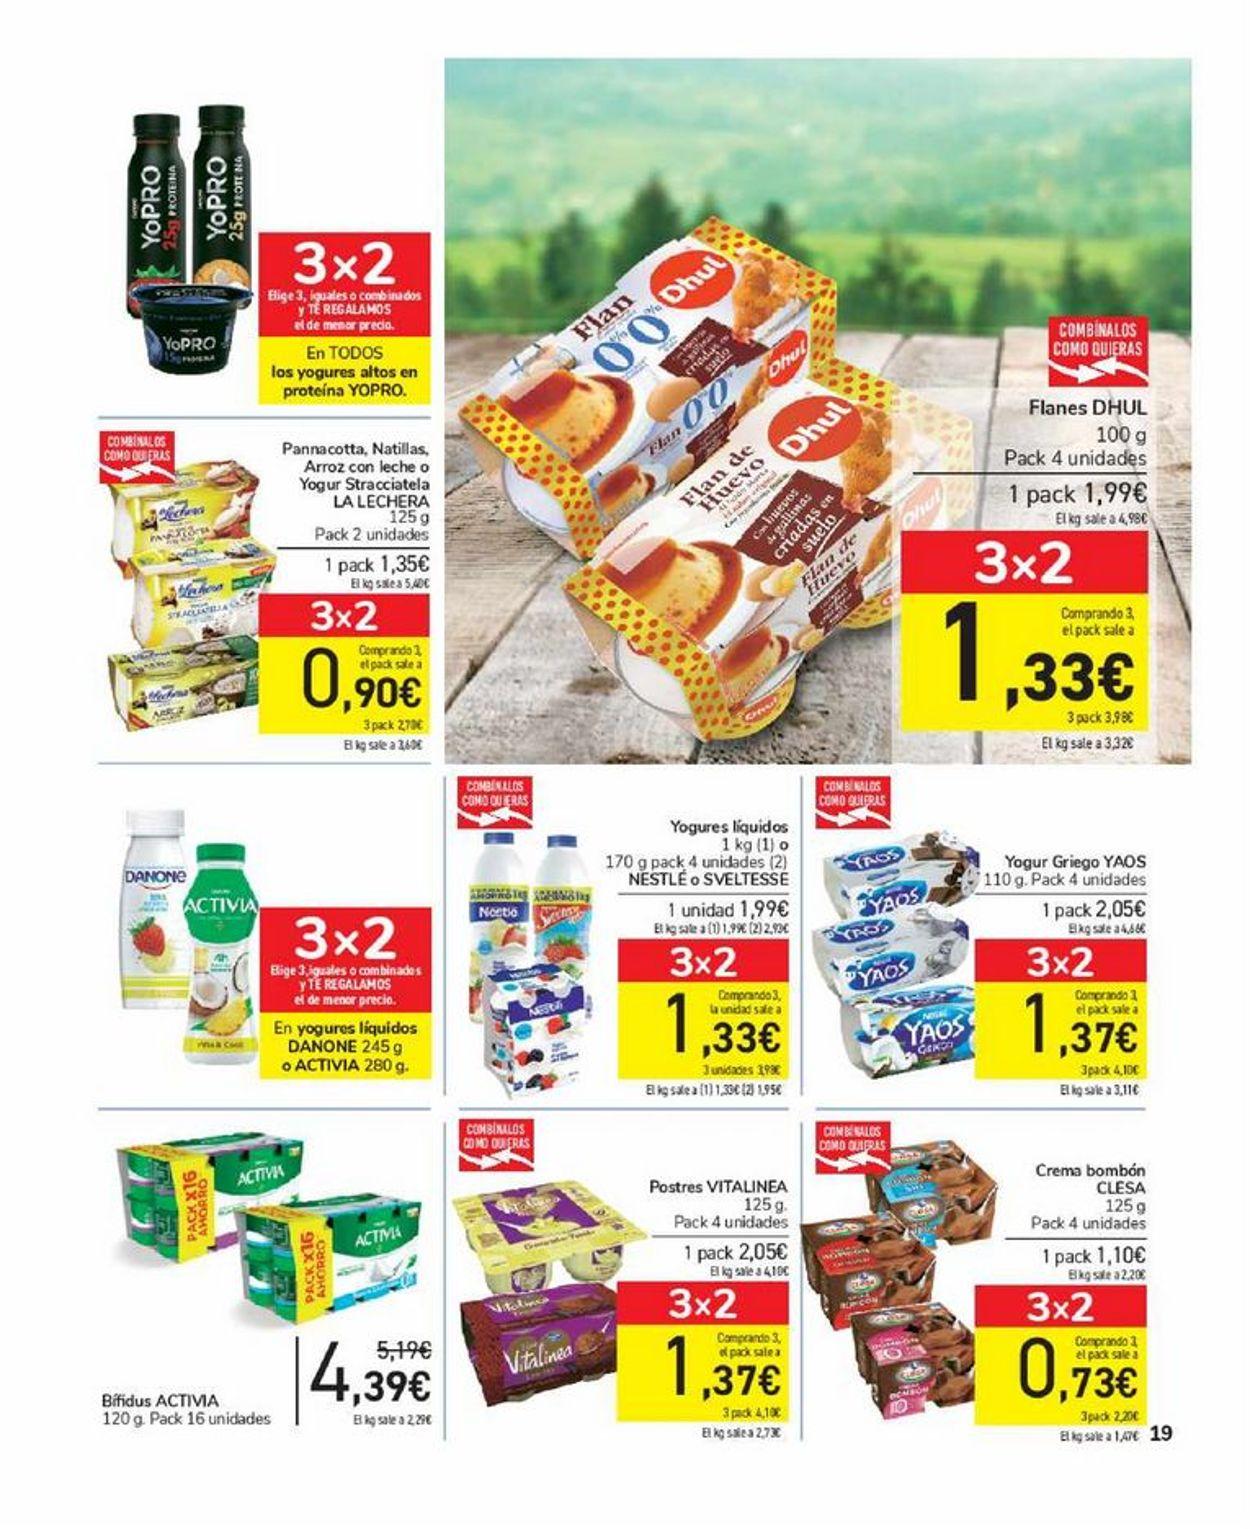 Carrefour Folleto - 17.06-29.06.2021 (Página 19)